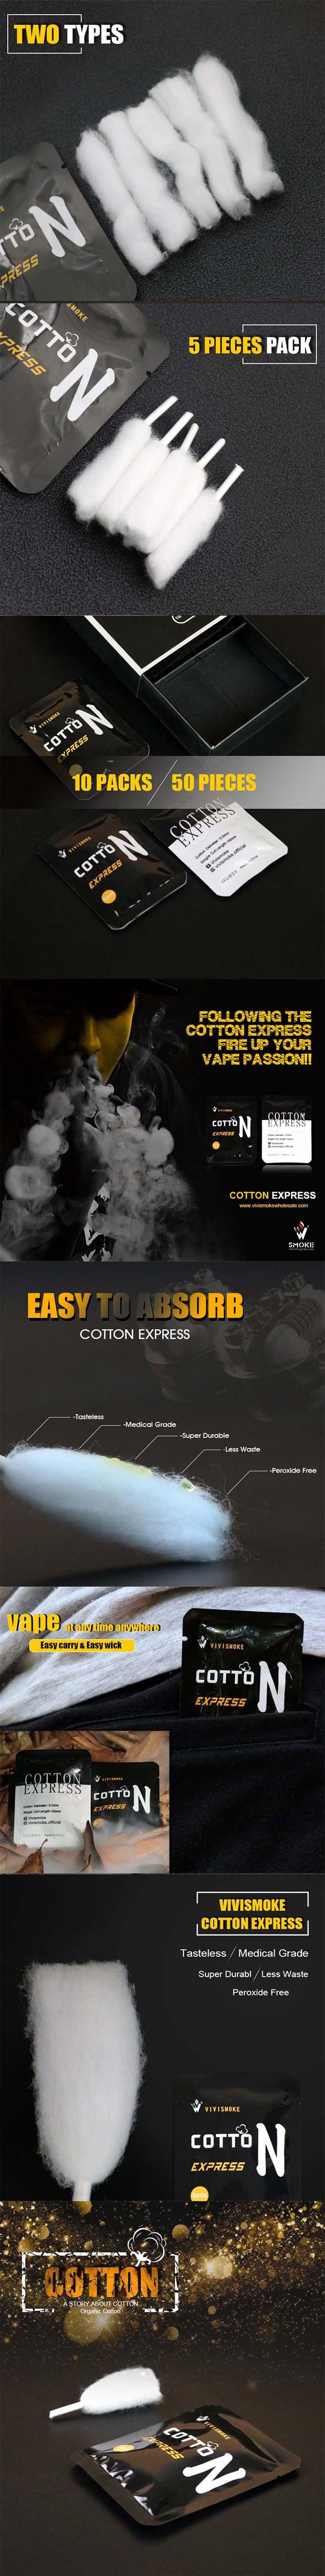 Vivismoke Organic Cotton Express for RBA / RDA / RTA / RDTA Vape Atomizer